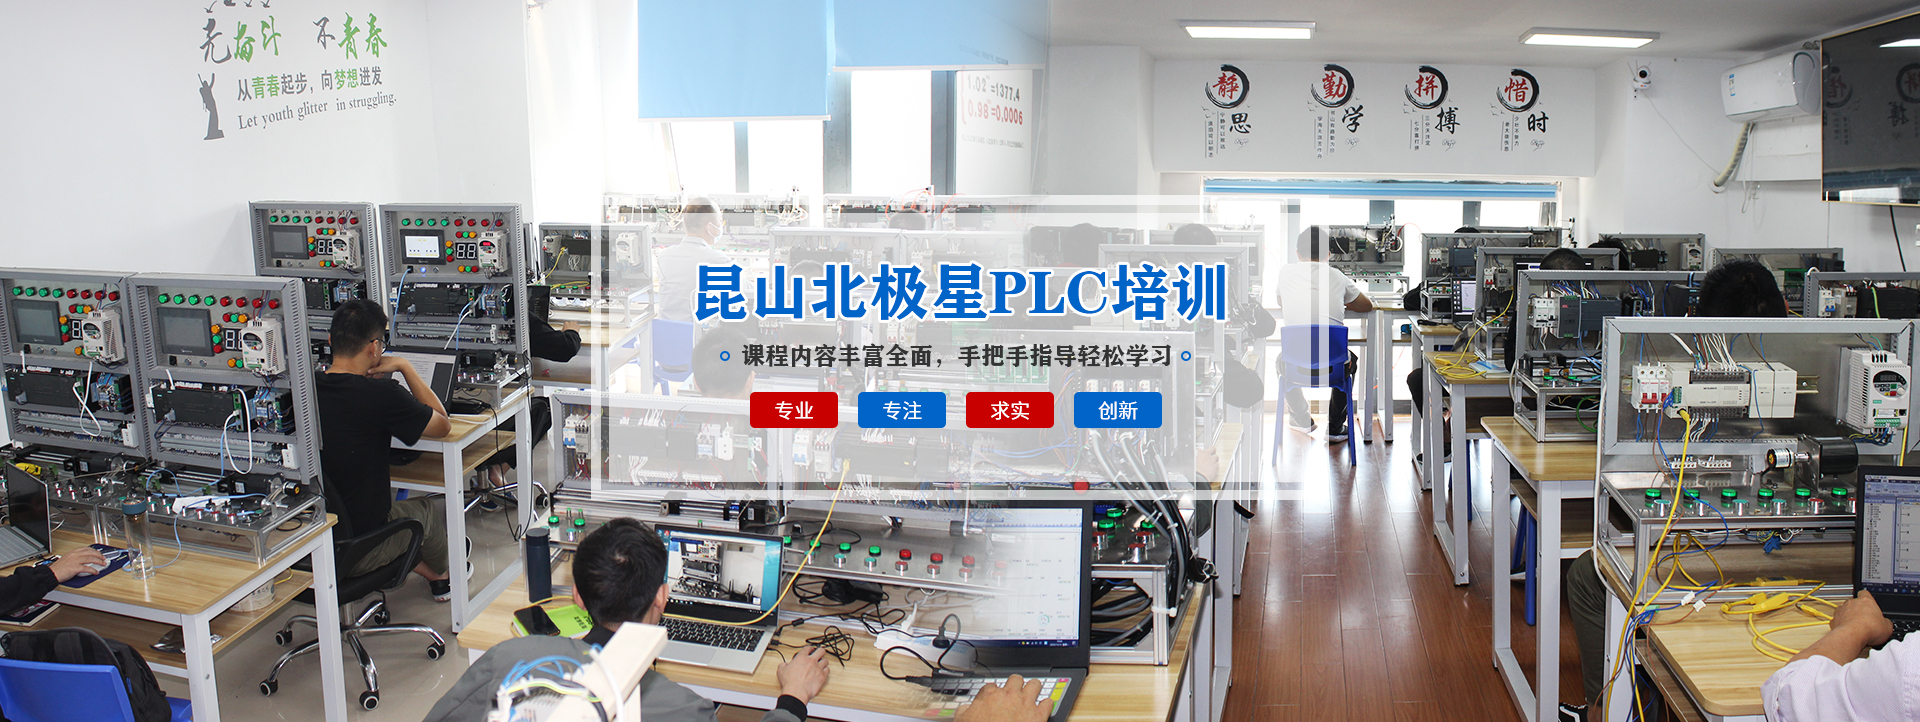 PLC培训学校